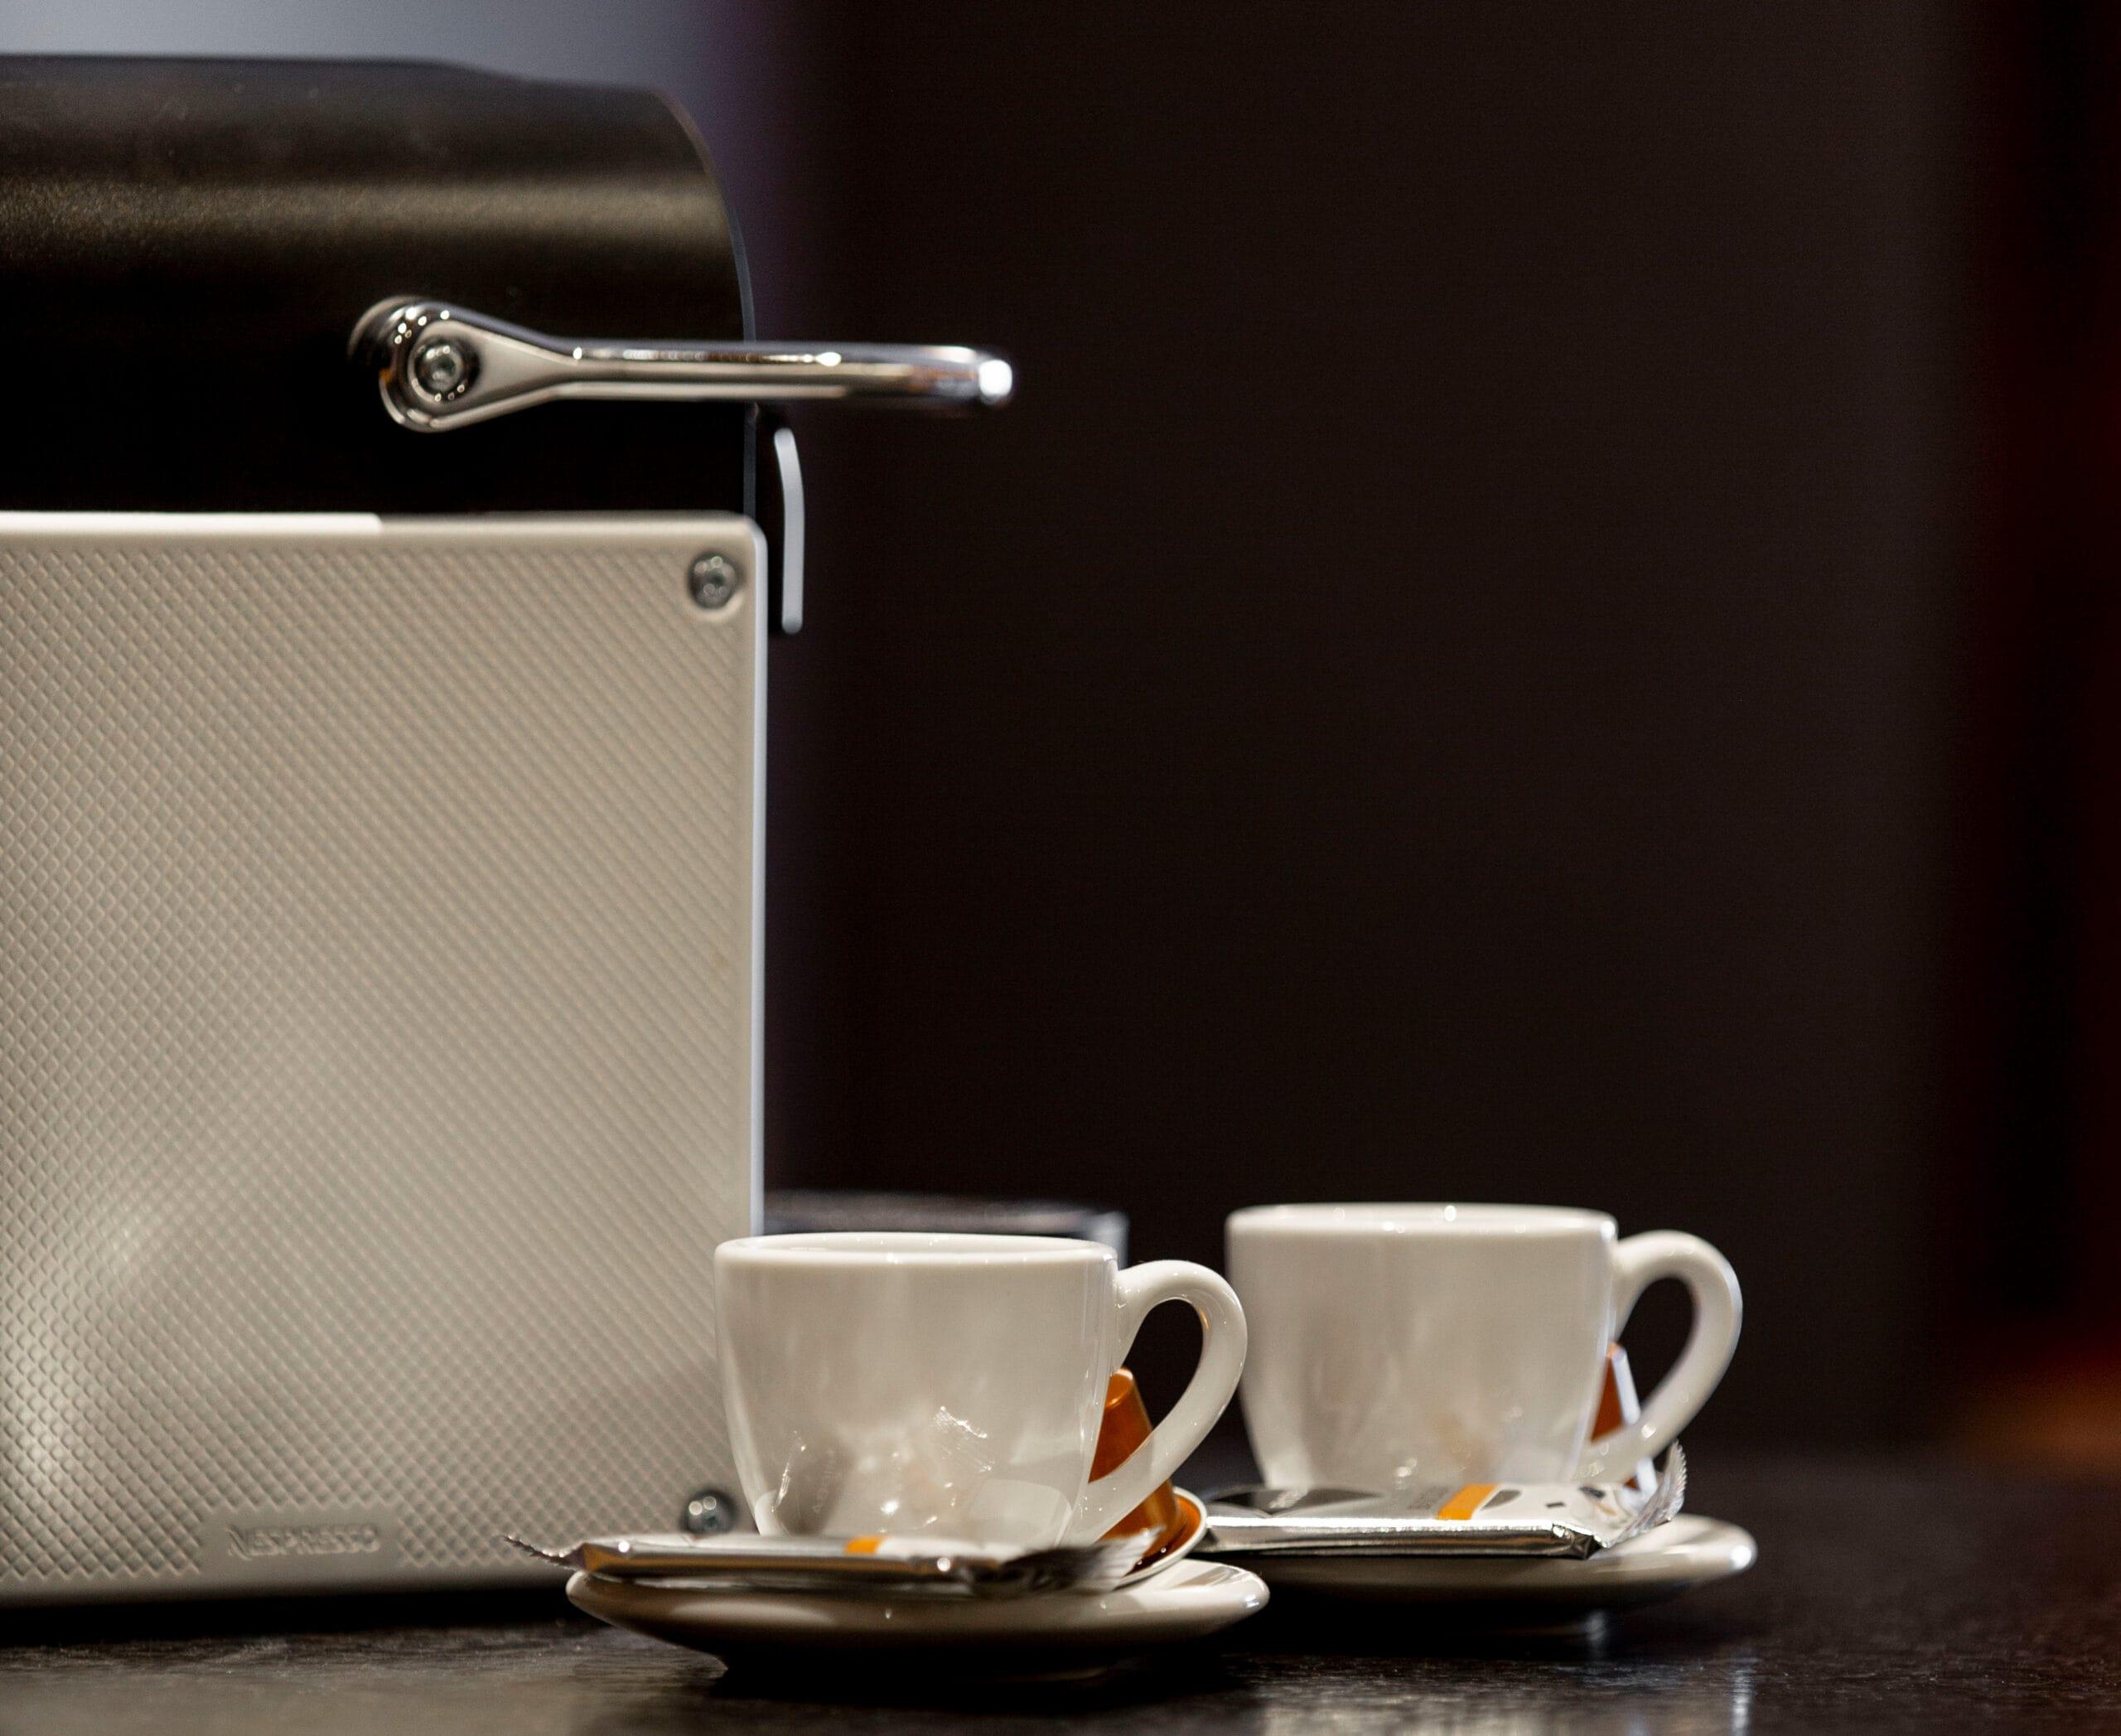 Hofgut-Wagrain-Apartment-Lifestyle-Resort-Inklusivleistungen-Apartment-Kaffeemaschine